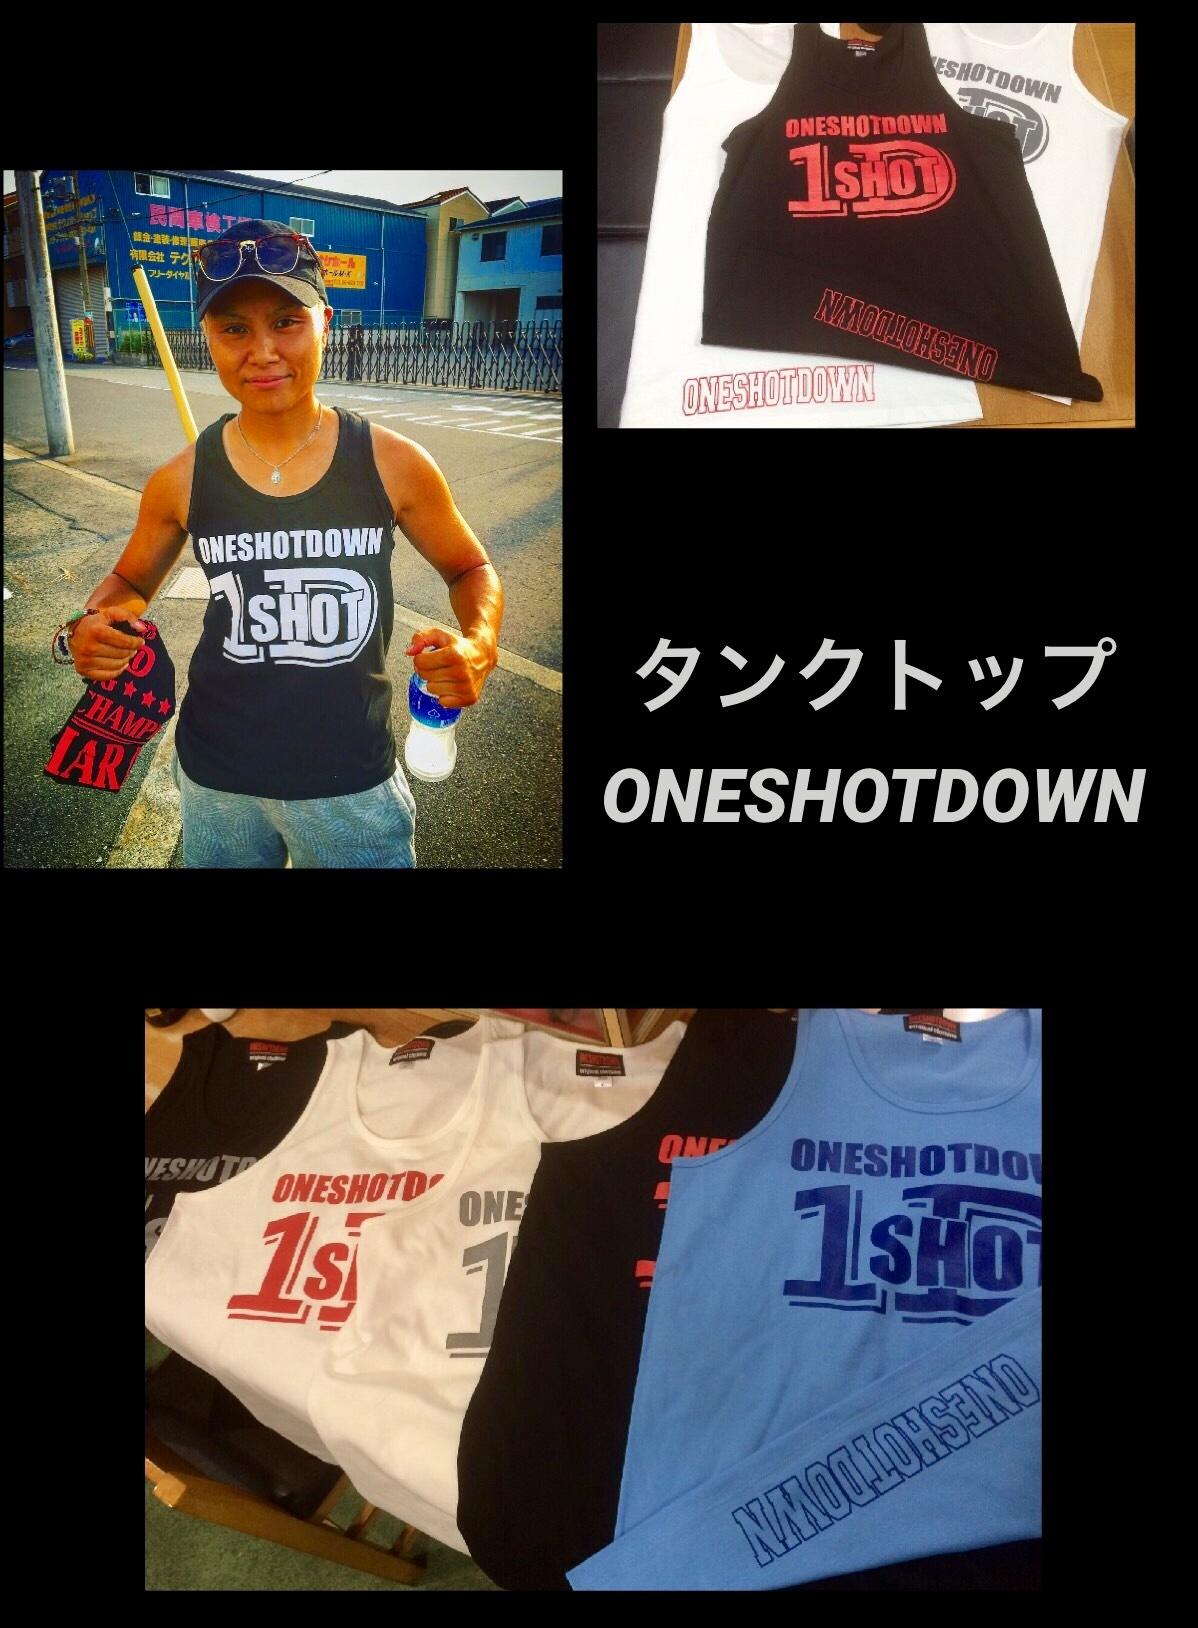 ONESHOTDOWN ロゴ タンクトップ - 画像5